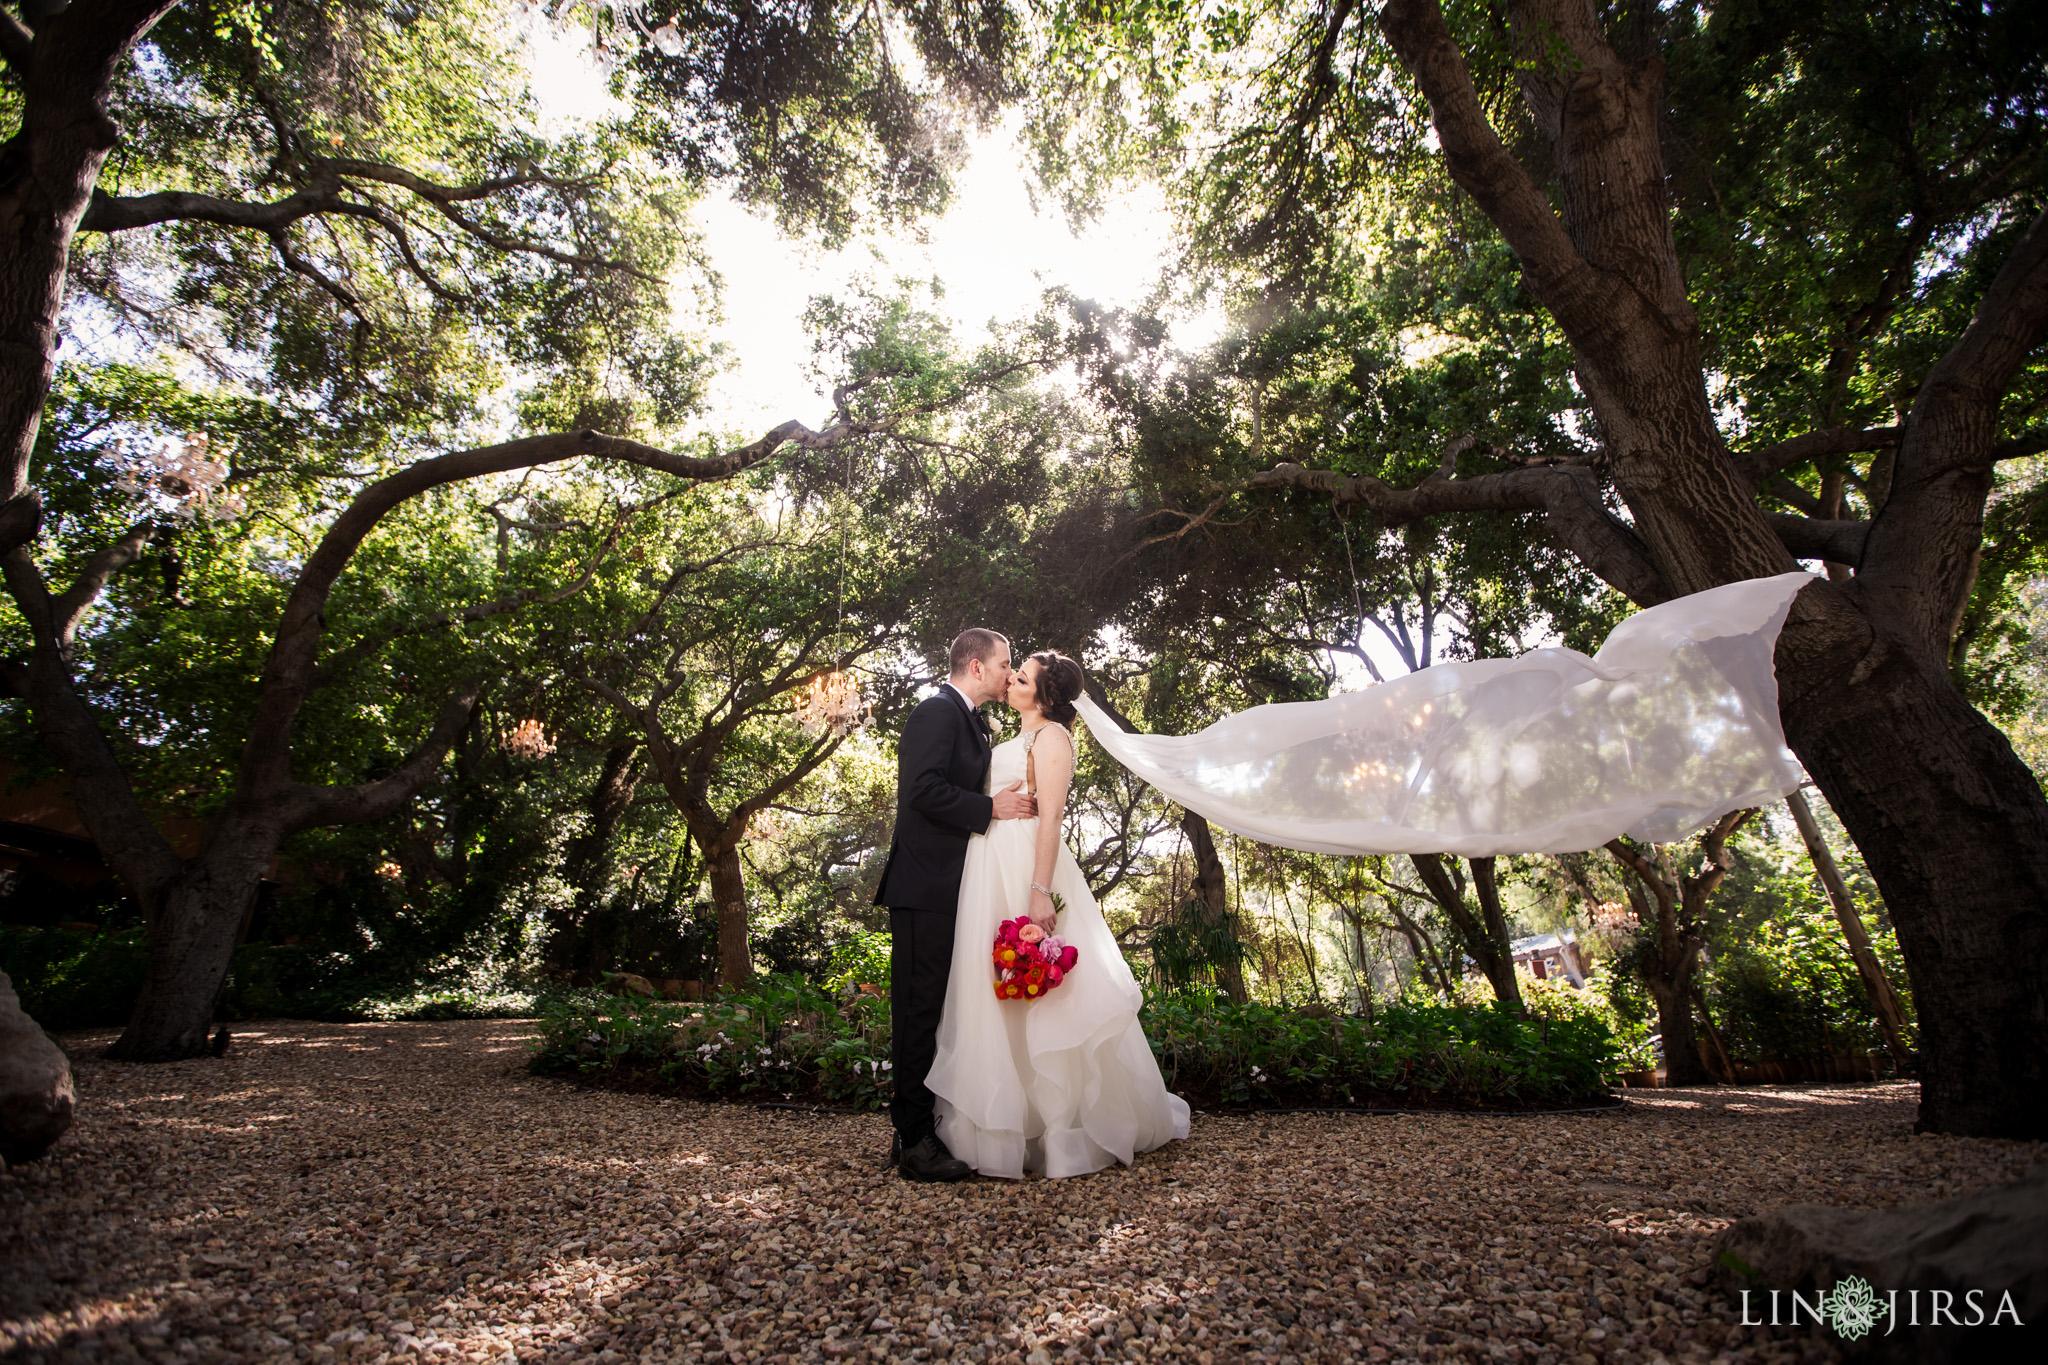 15 Calamigos Ranch Malibu Wedding Photography